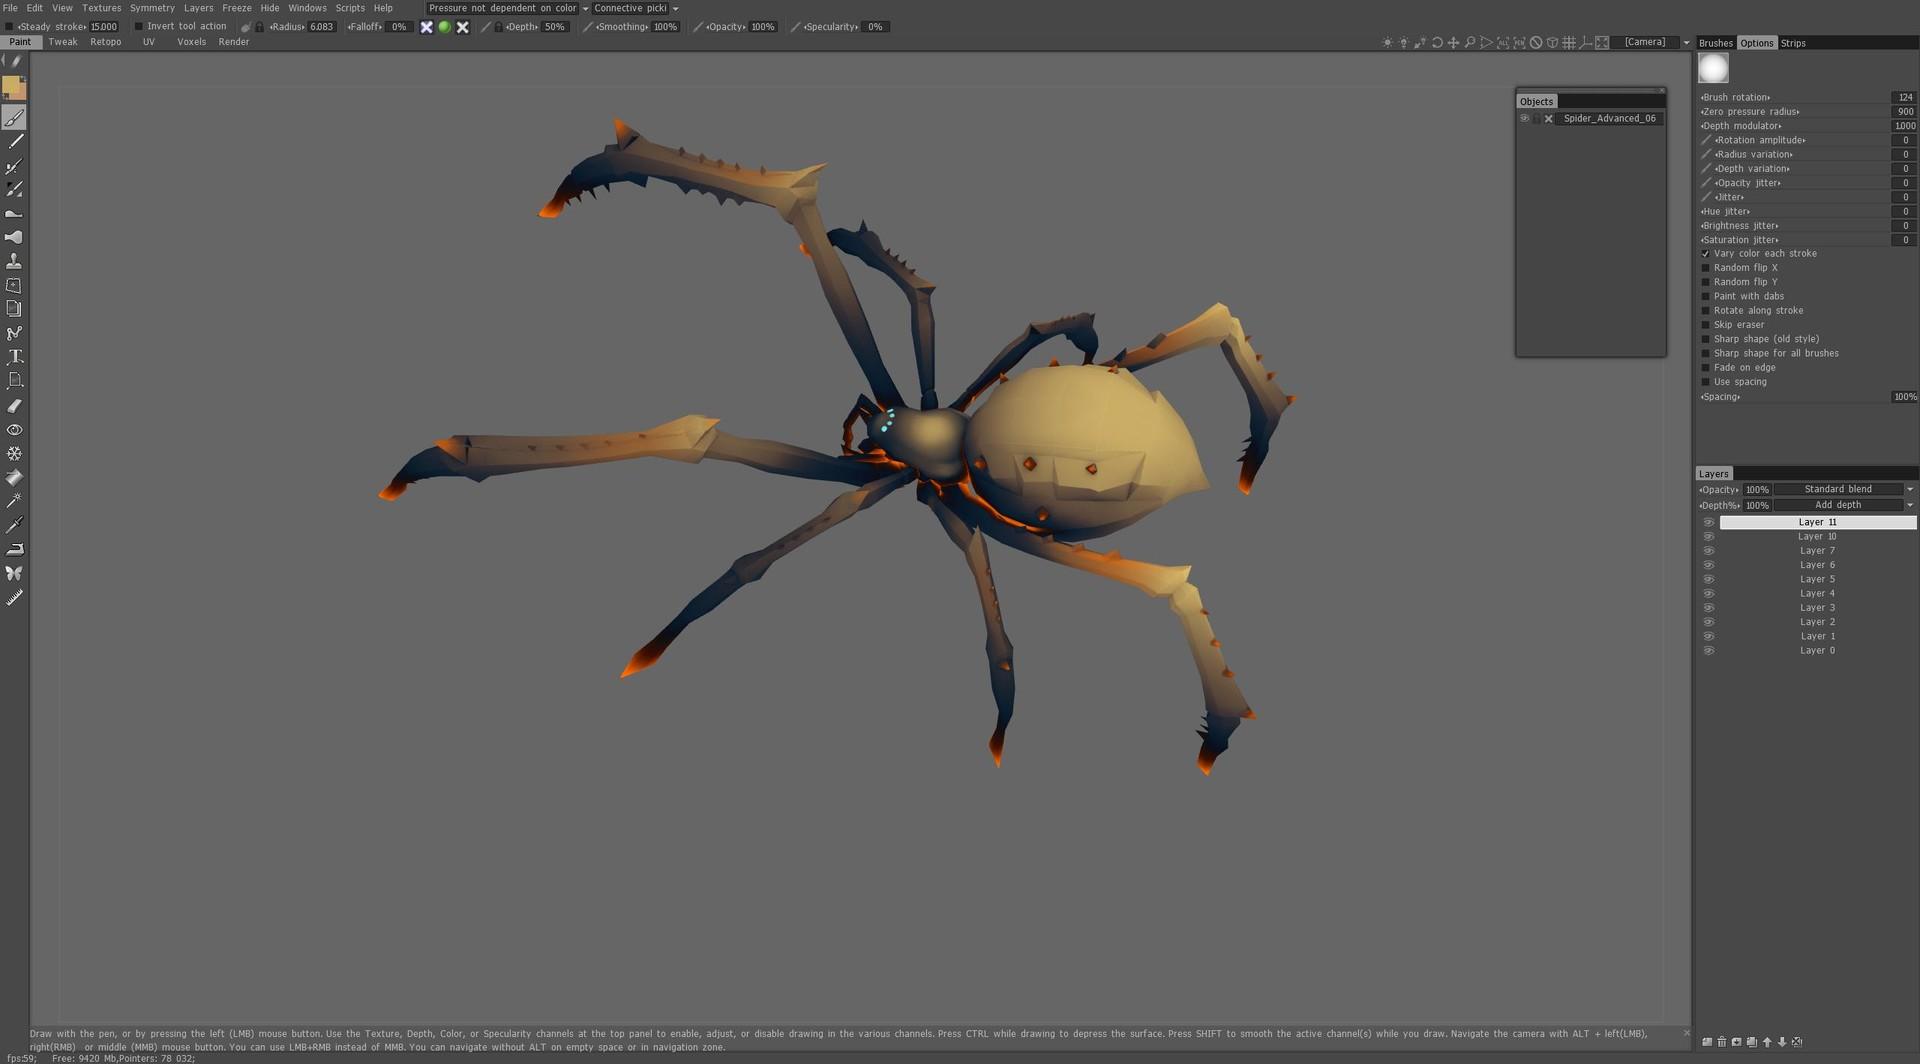 Occultart   spider adv 06 a01 005 3b